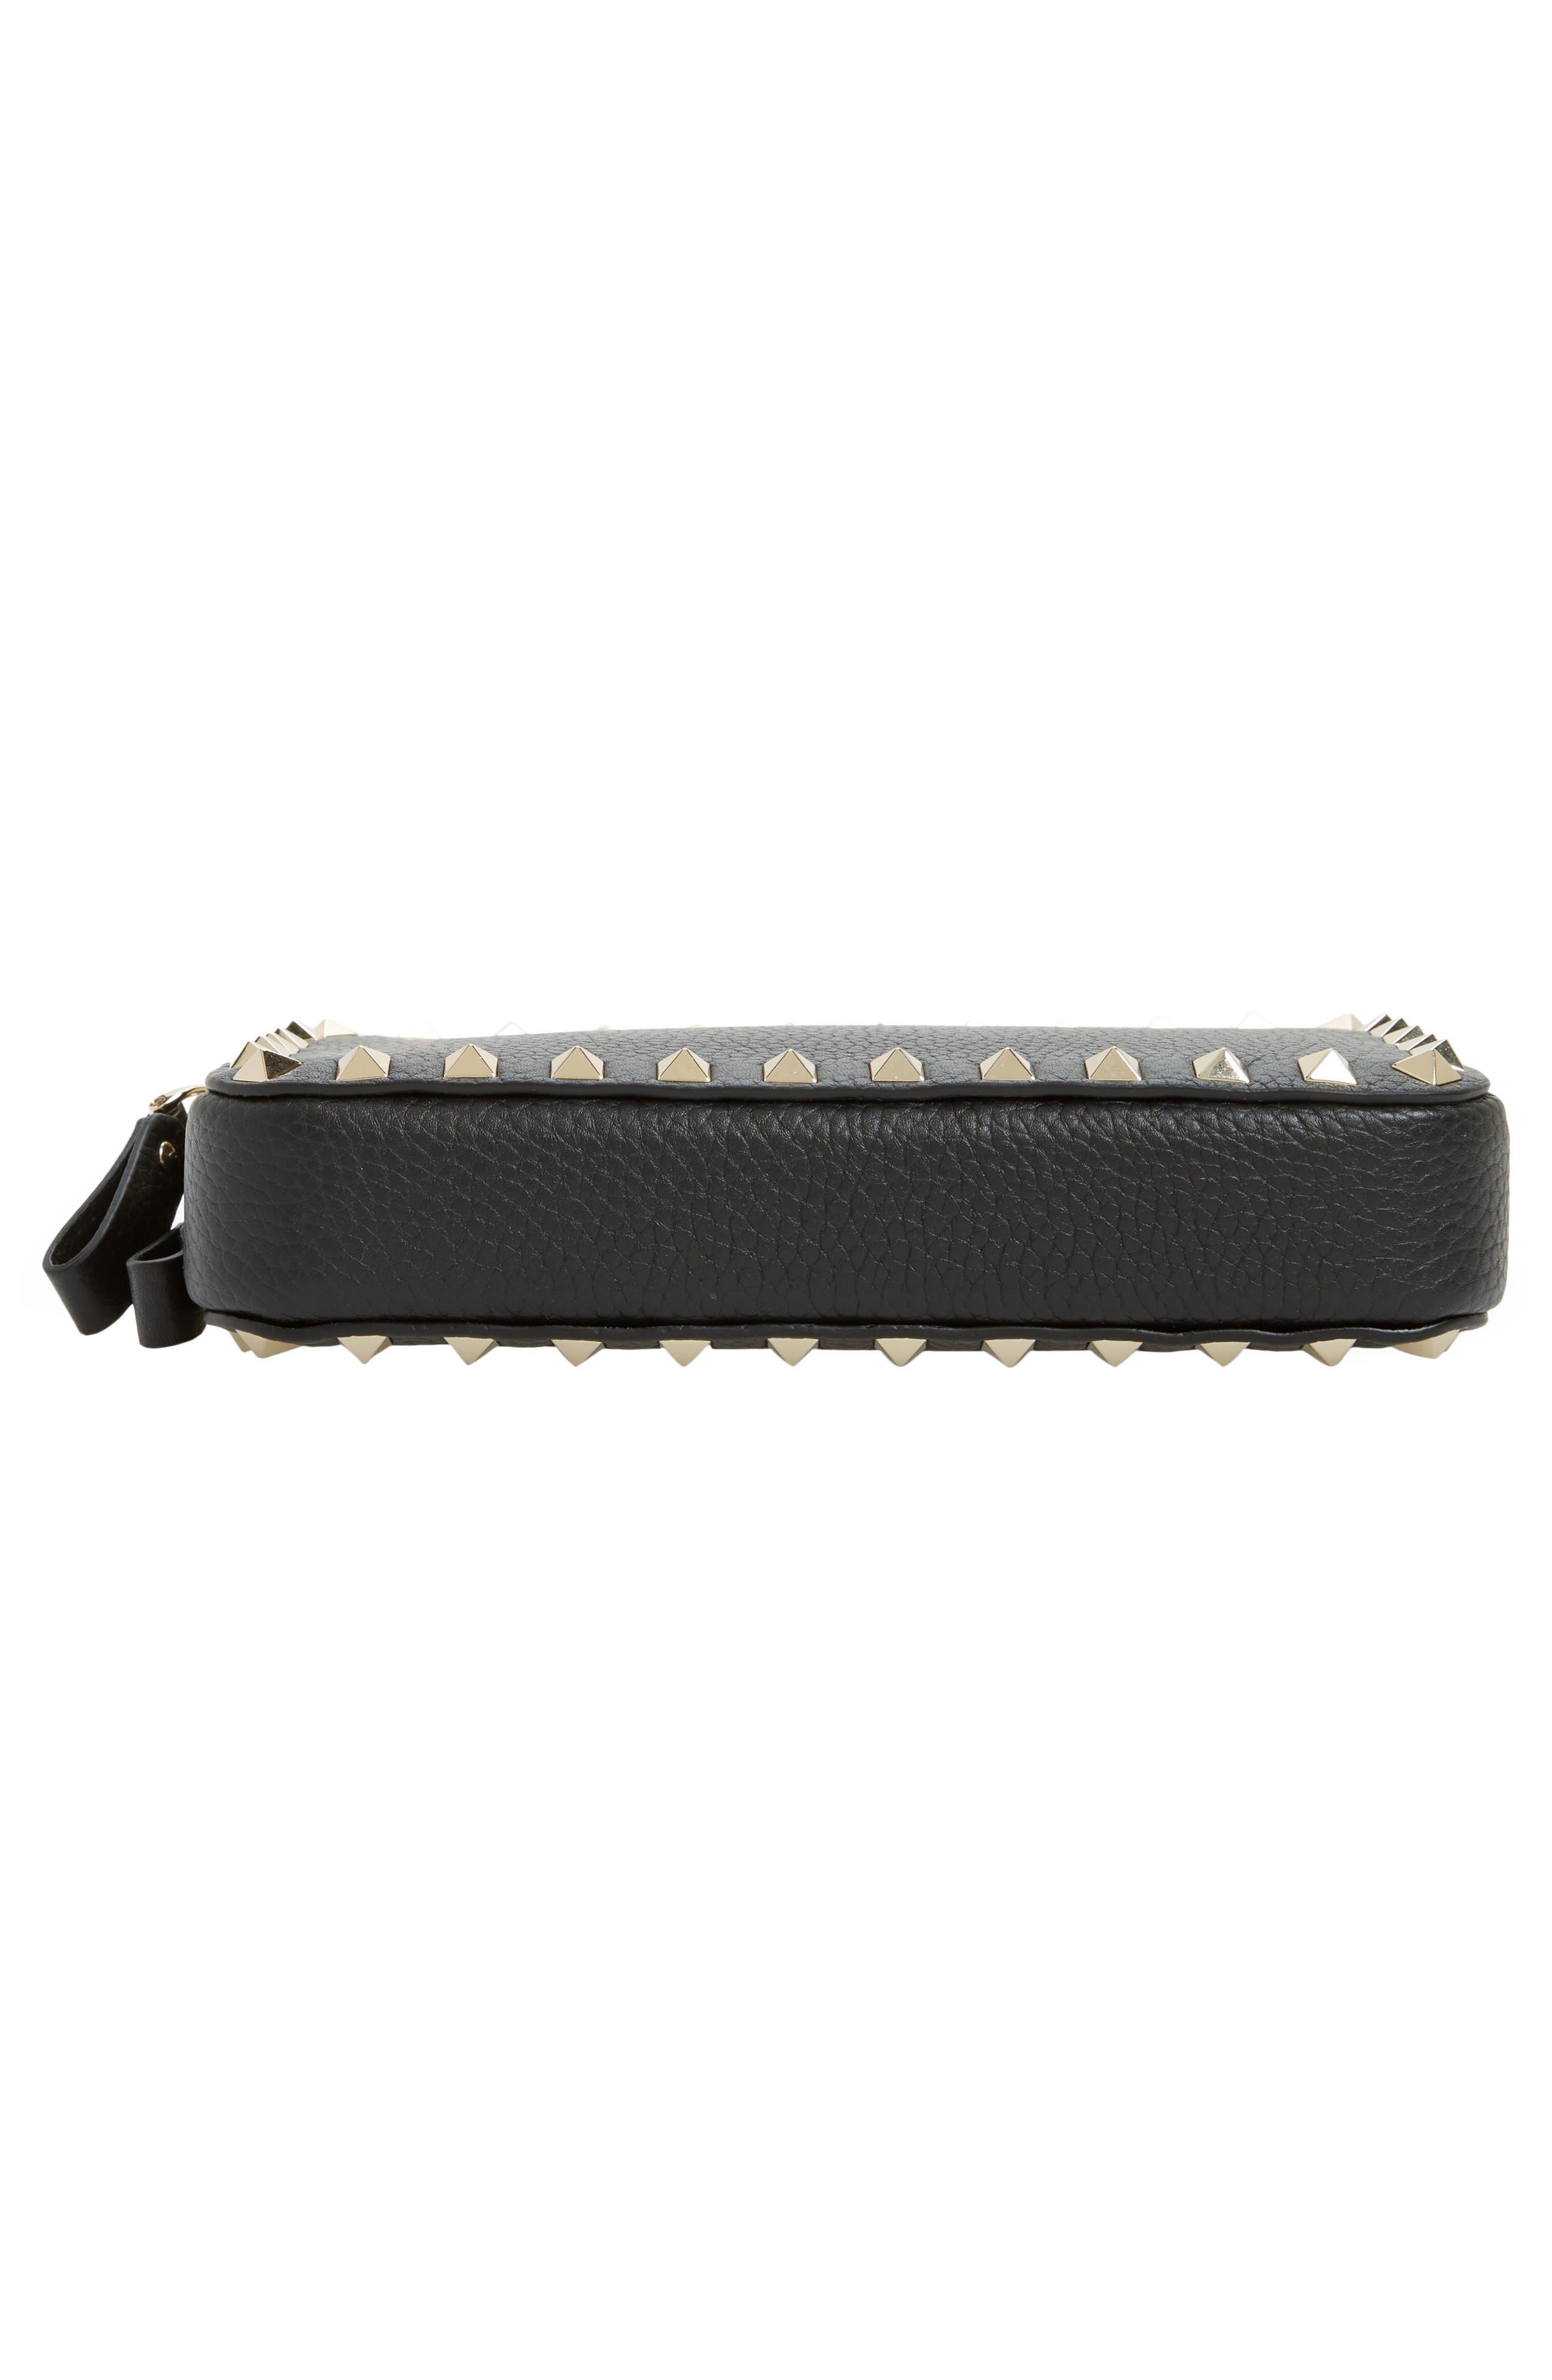 Mini Calfskin Leather Camera Bag,                             Alternate thumbnail 6, color,                             001